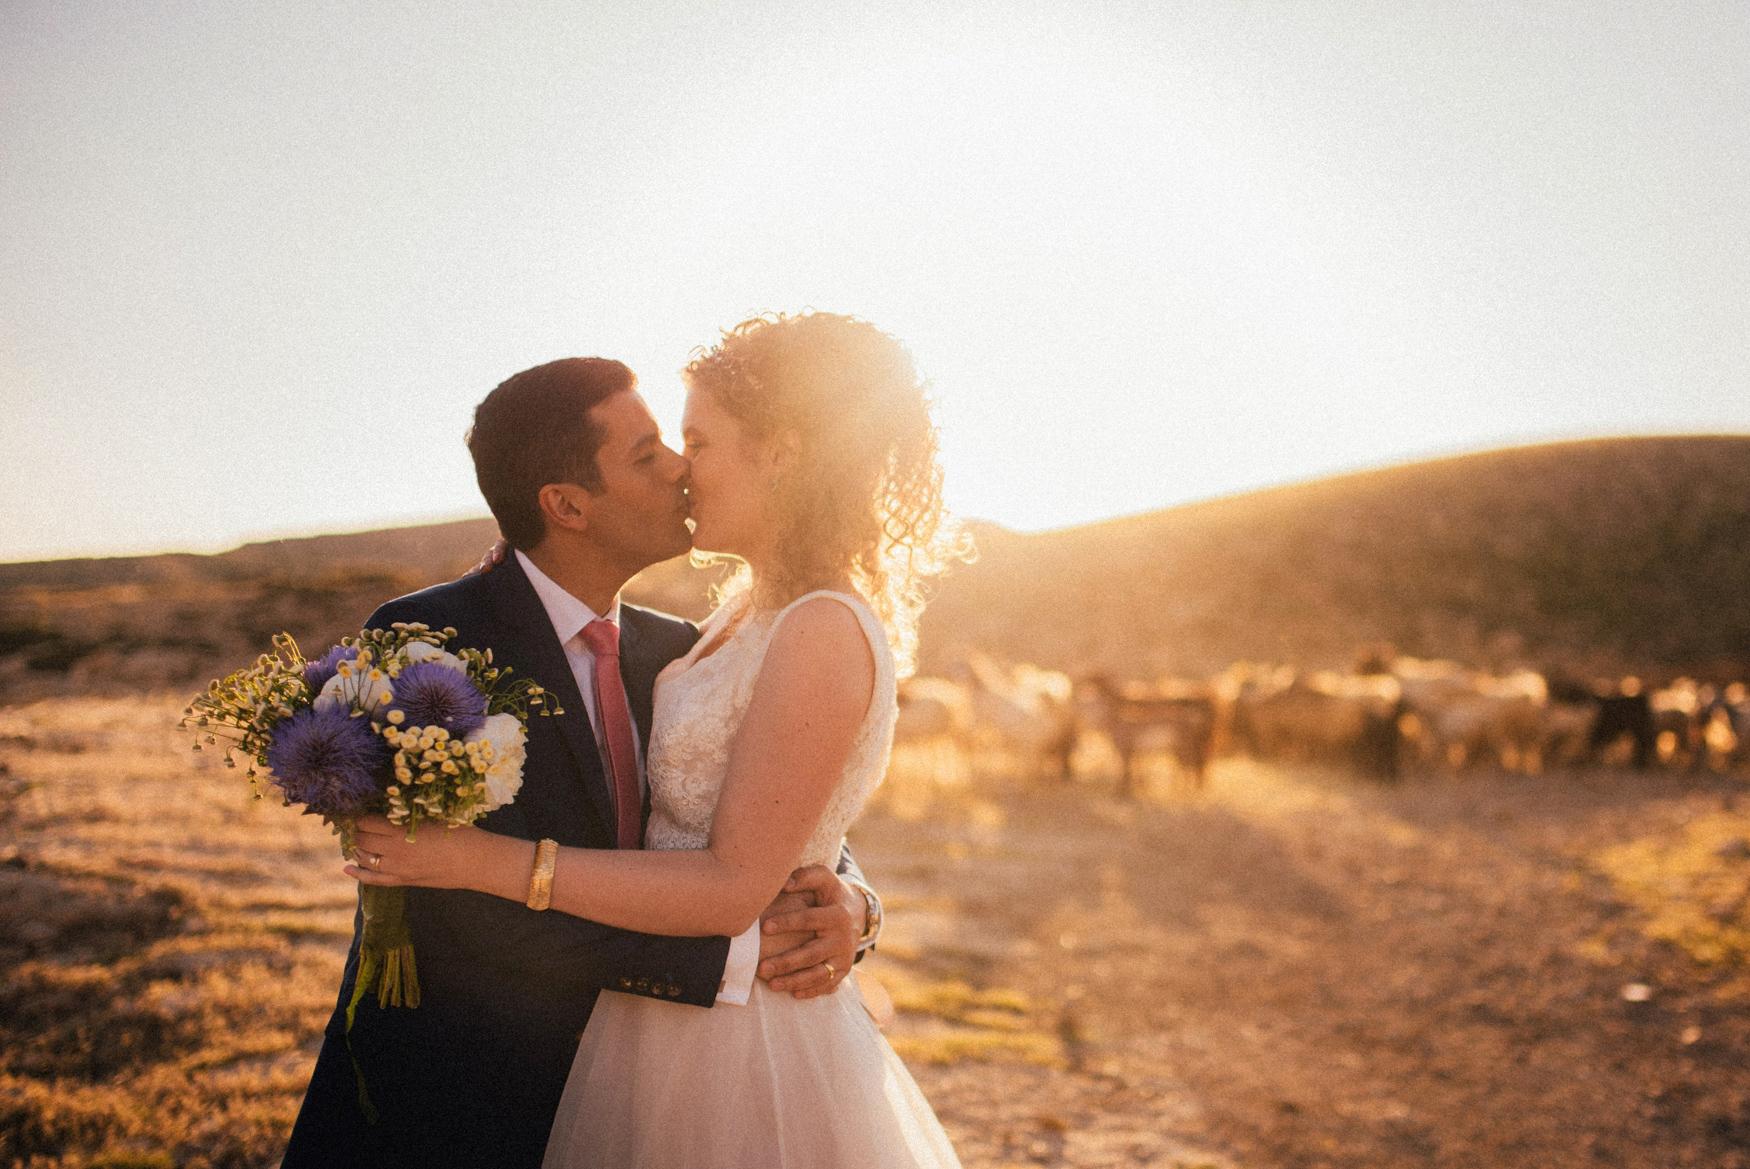 LR4 byblos beirut faraya wedding photographer portraits 017.jpg